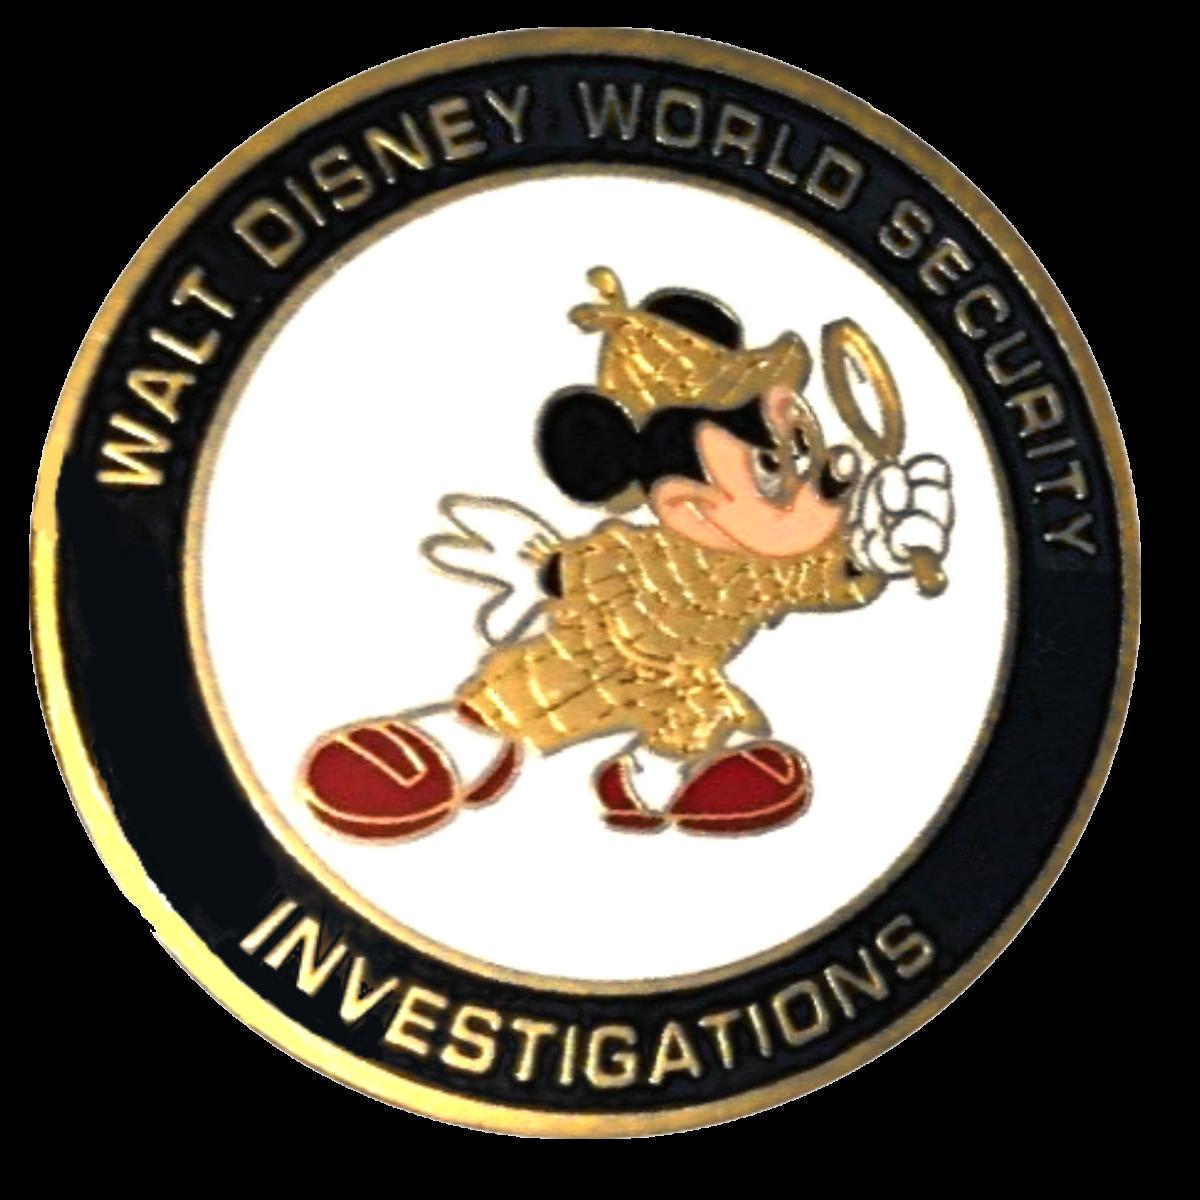 A Sherlockian Challenge Coin from Walt Disney World